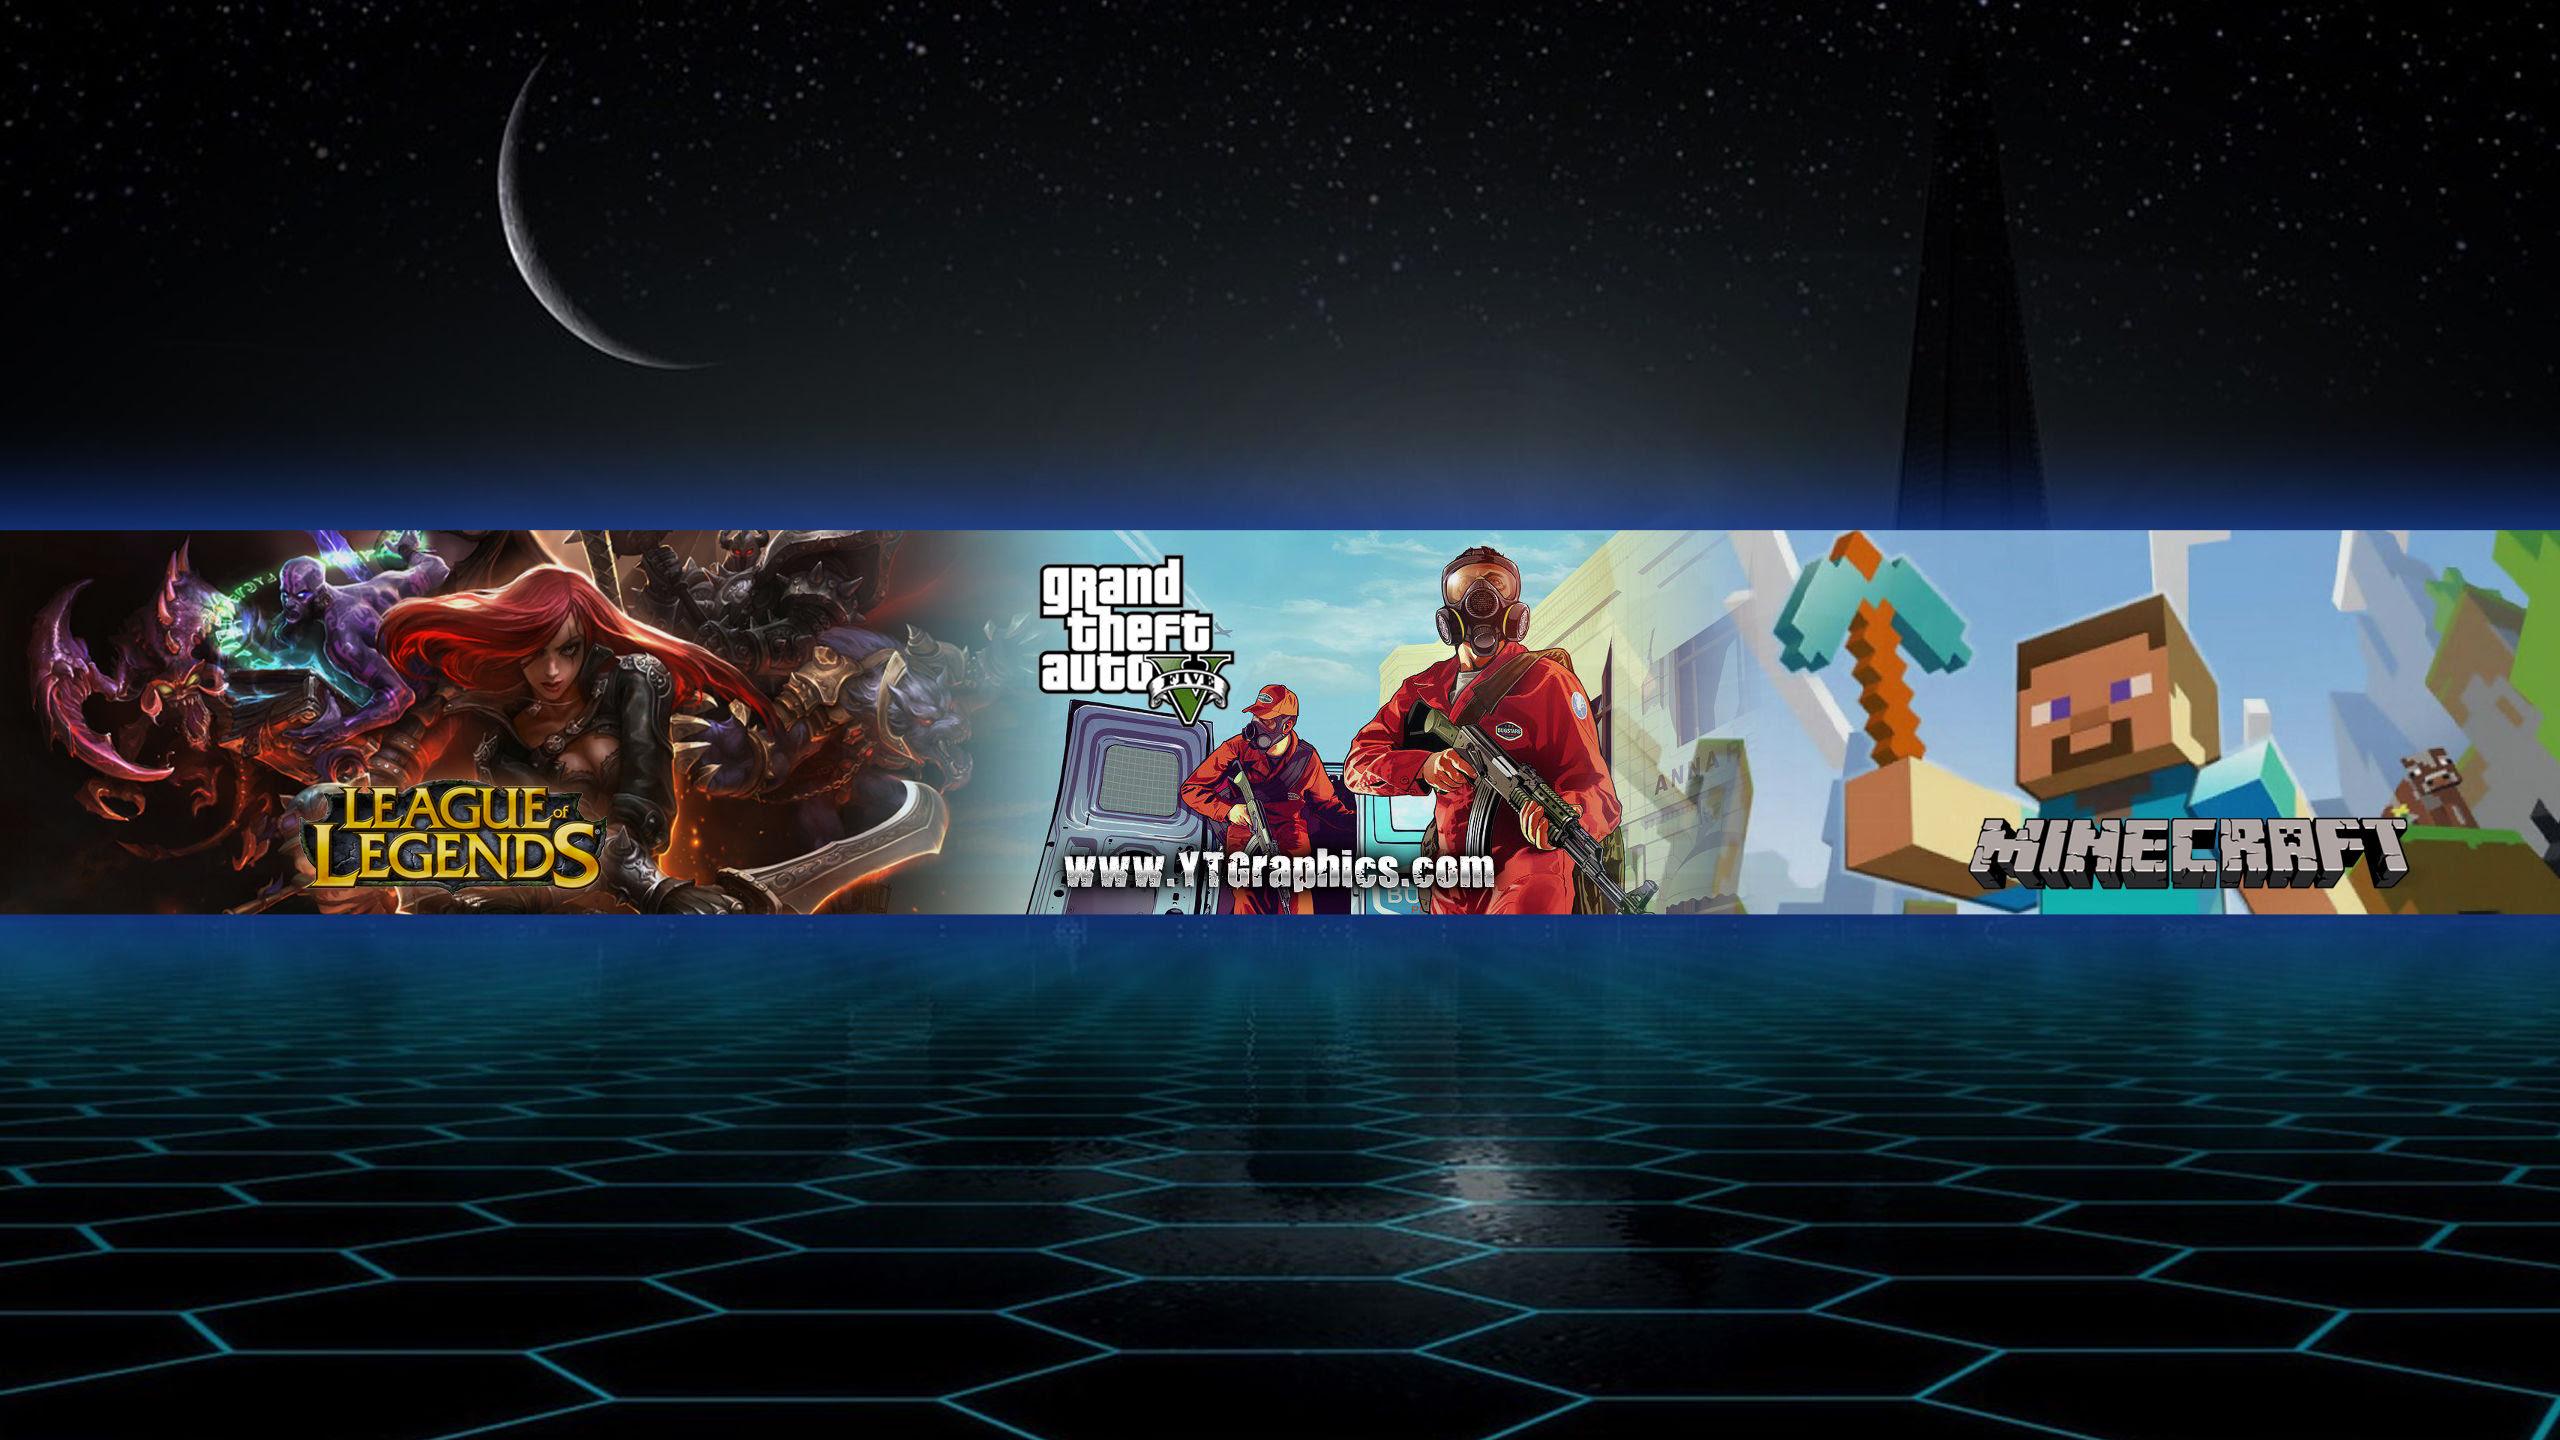 Image Minecraft 2560 X 1440 Jpg Omong X